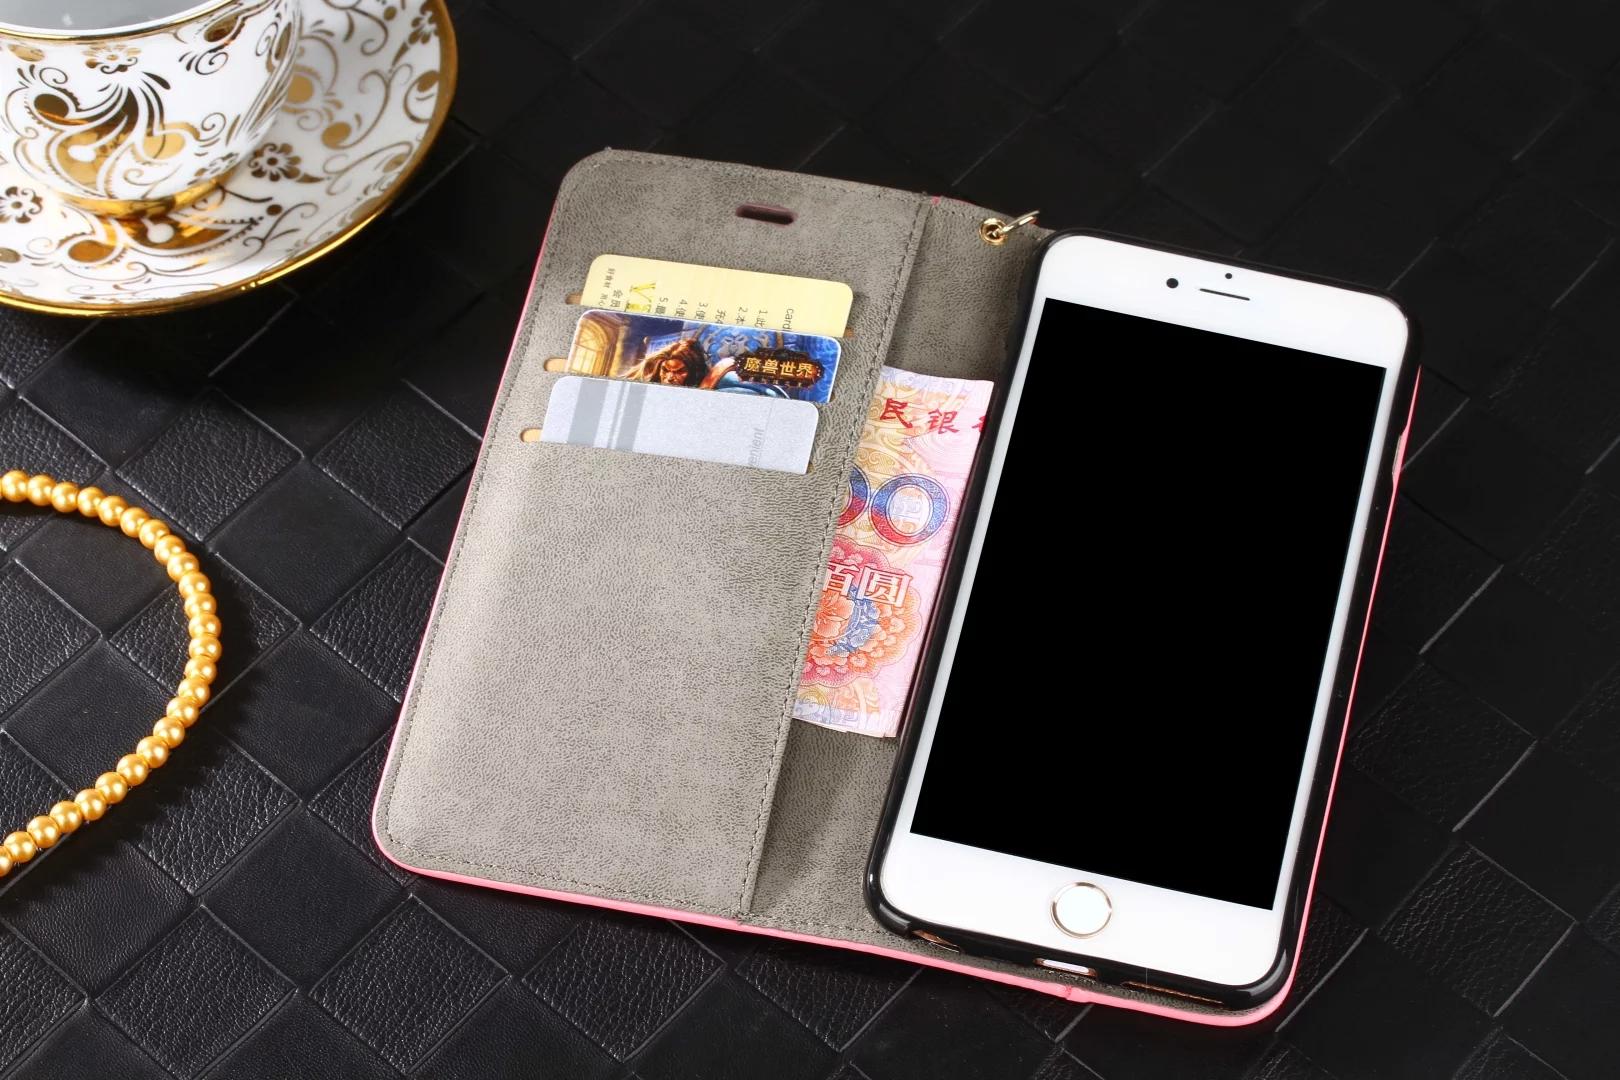 handyhülle foto iphone iphone hülle leder coach iphone 8 hüllen wann kommt das neue iphone 8 rote iphone 8 hülle apple handytasche neue funktionen iphone 8 cover für iphone iphone 3s hülle